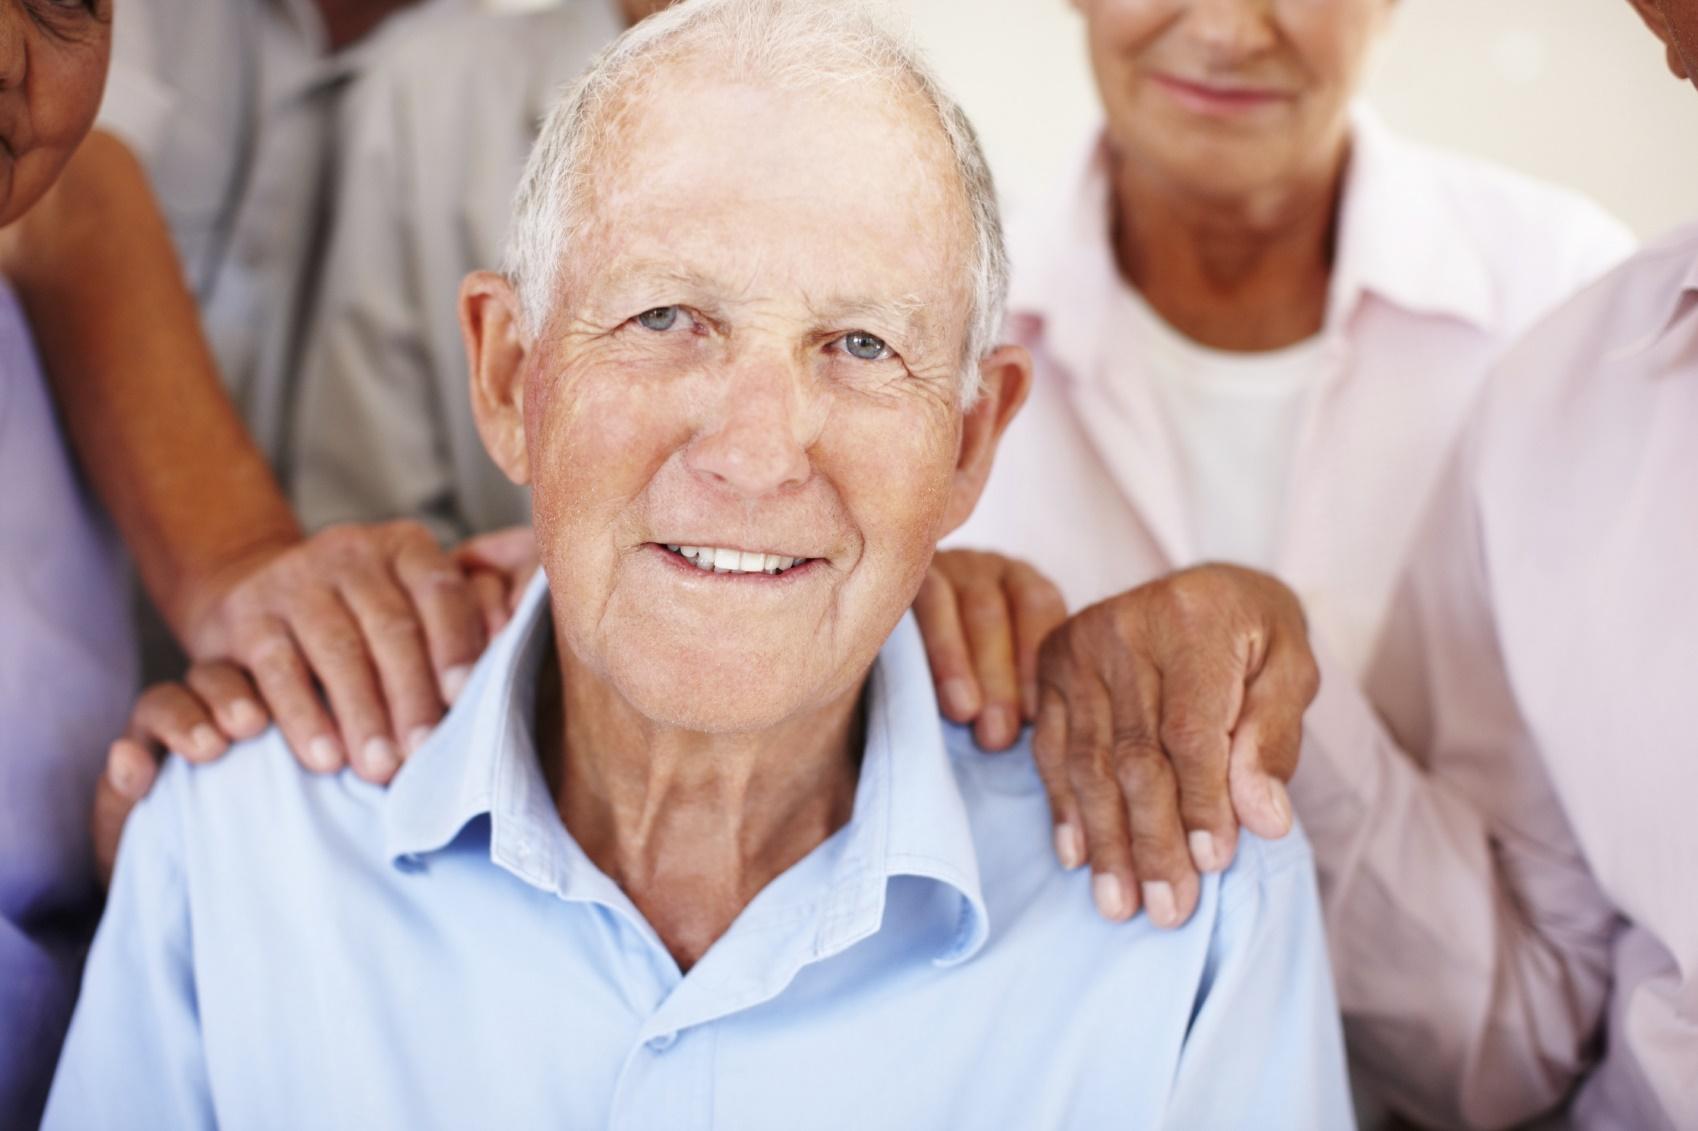 alzheimers older man